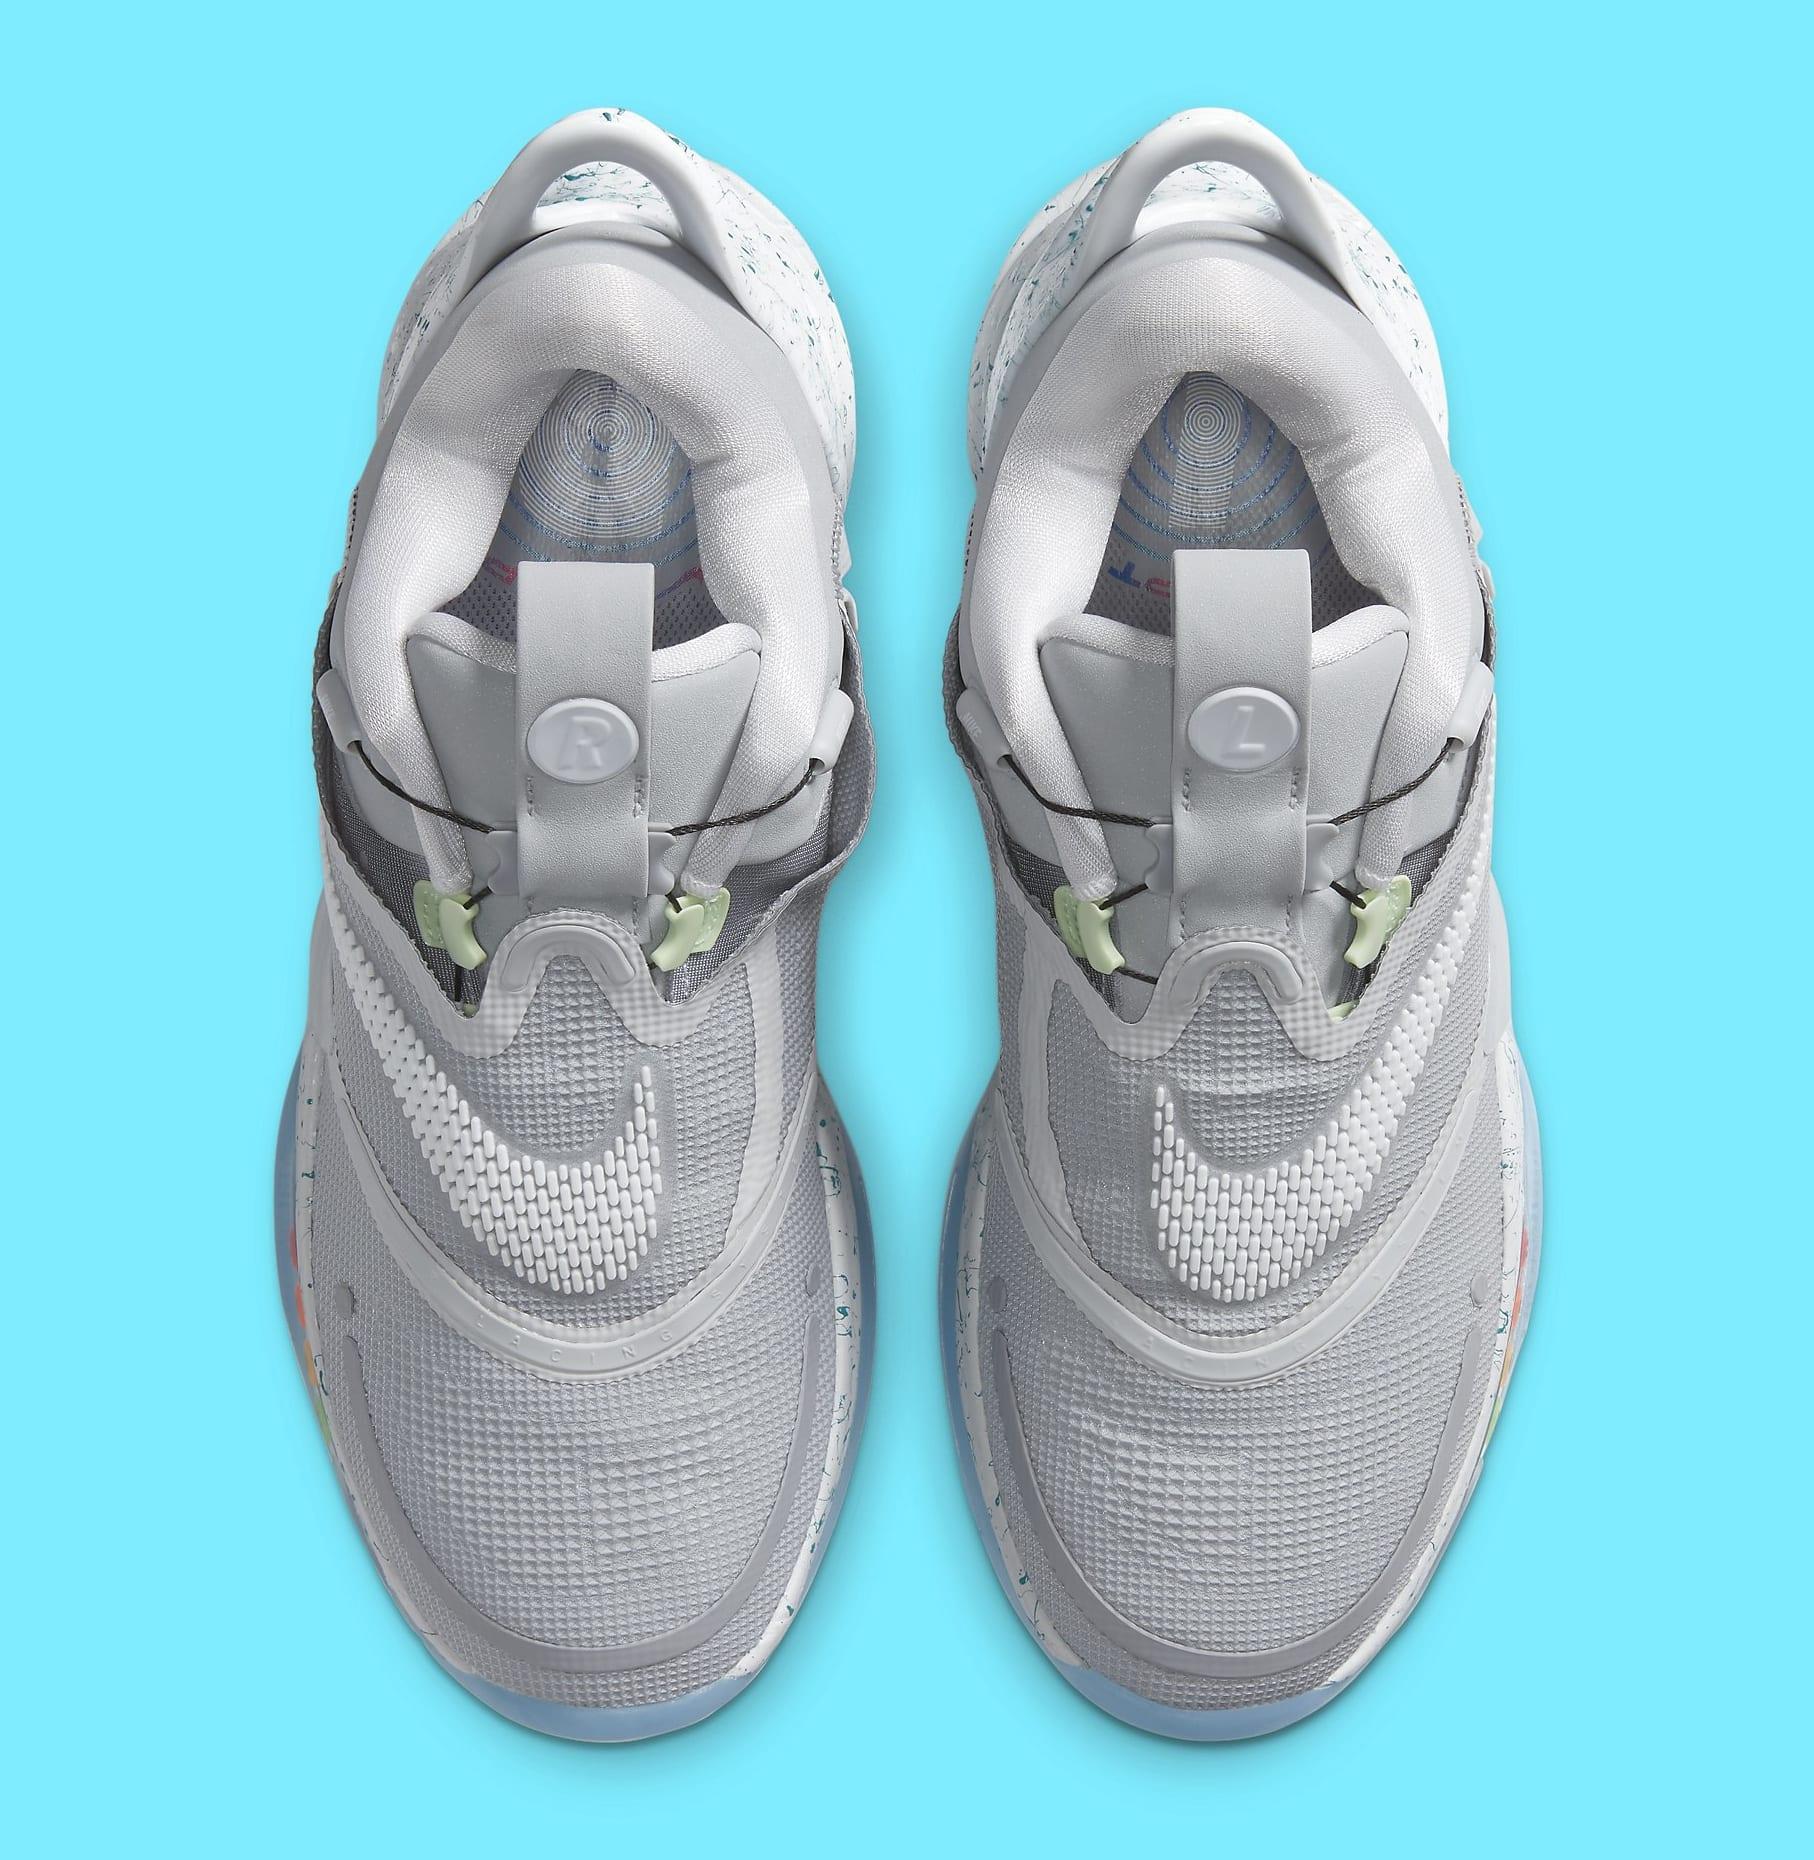 Nike Adapt BB 2.0 'Mag' BQ5397-003 Top